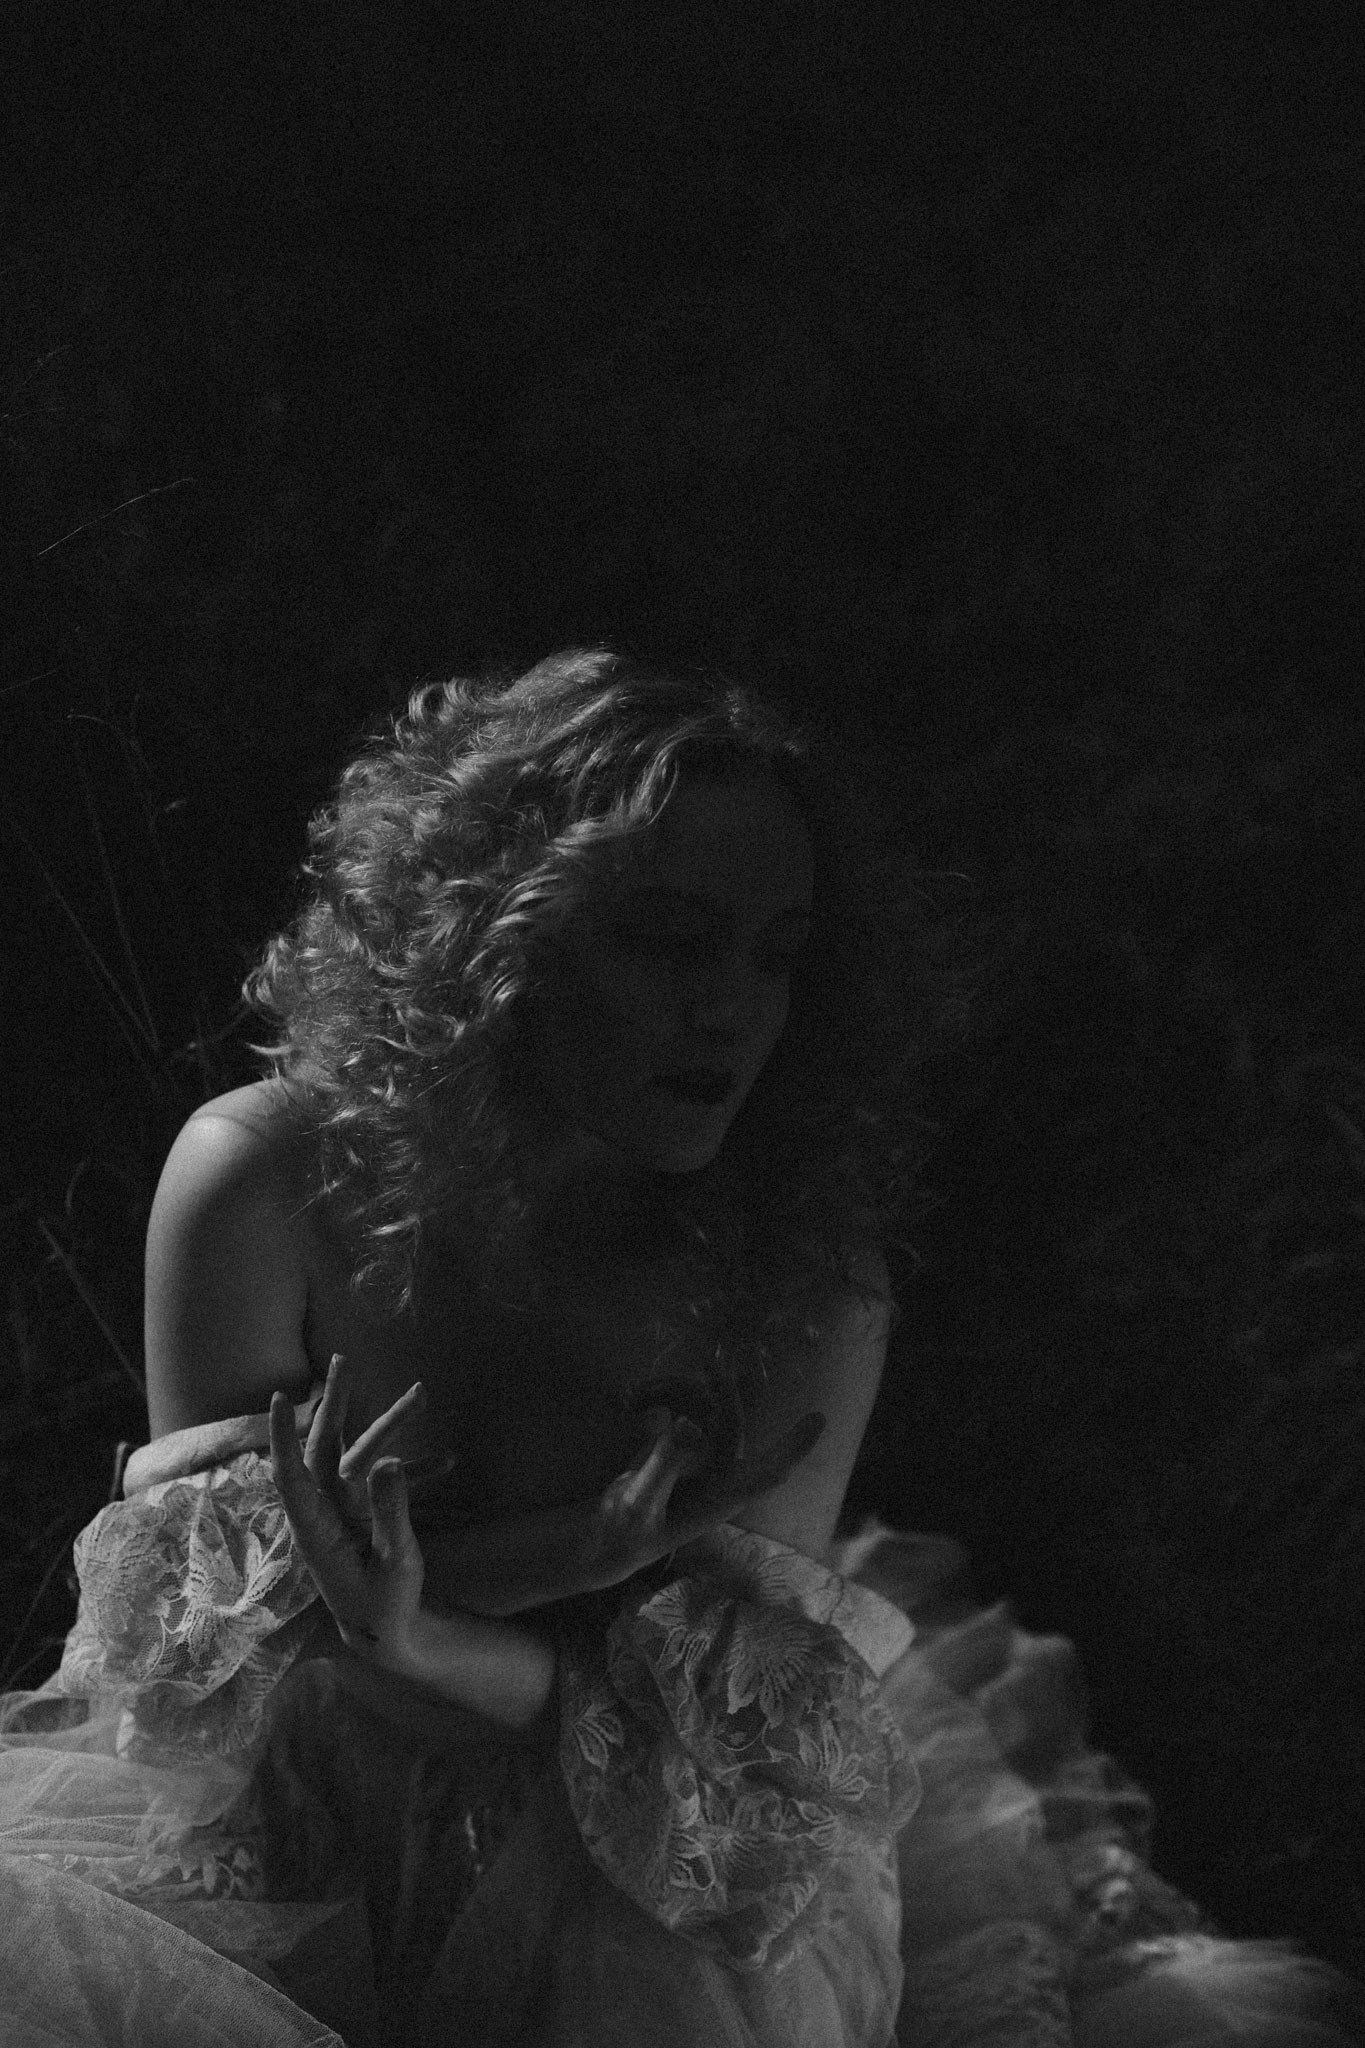 pale-witch-097fb.jpg